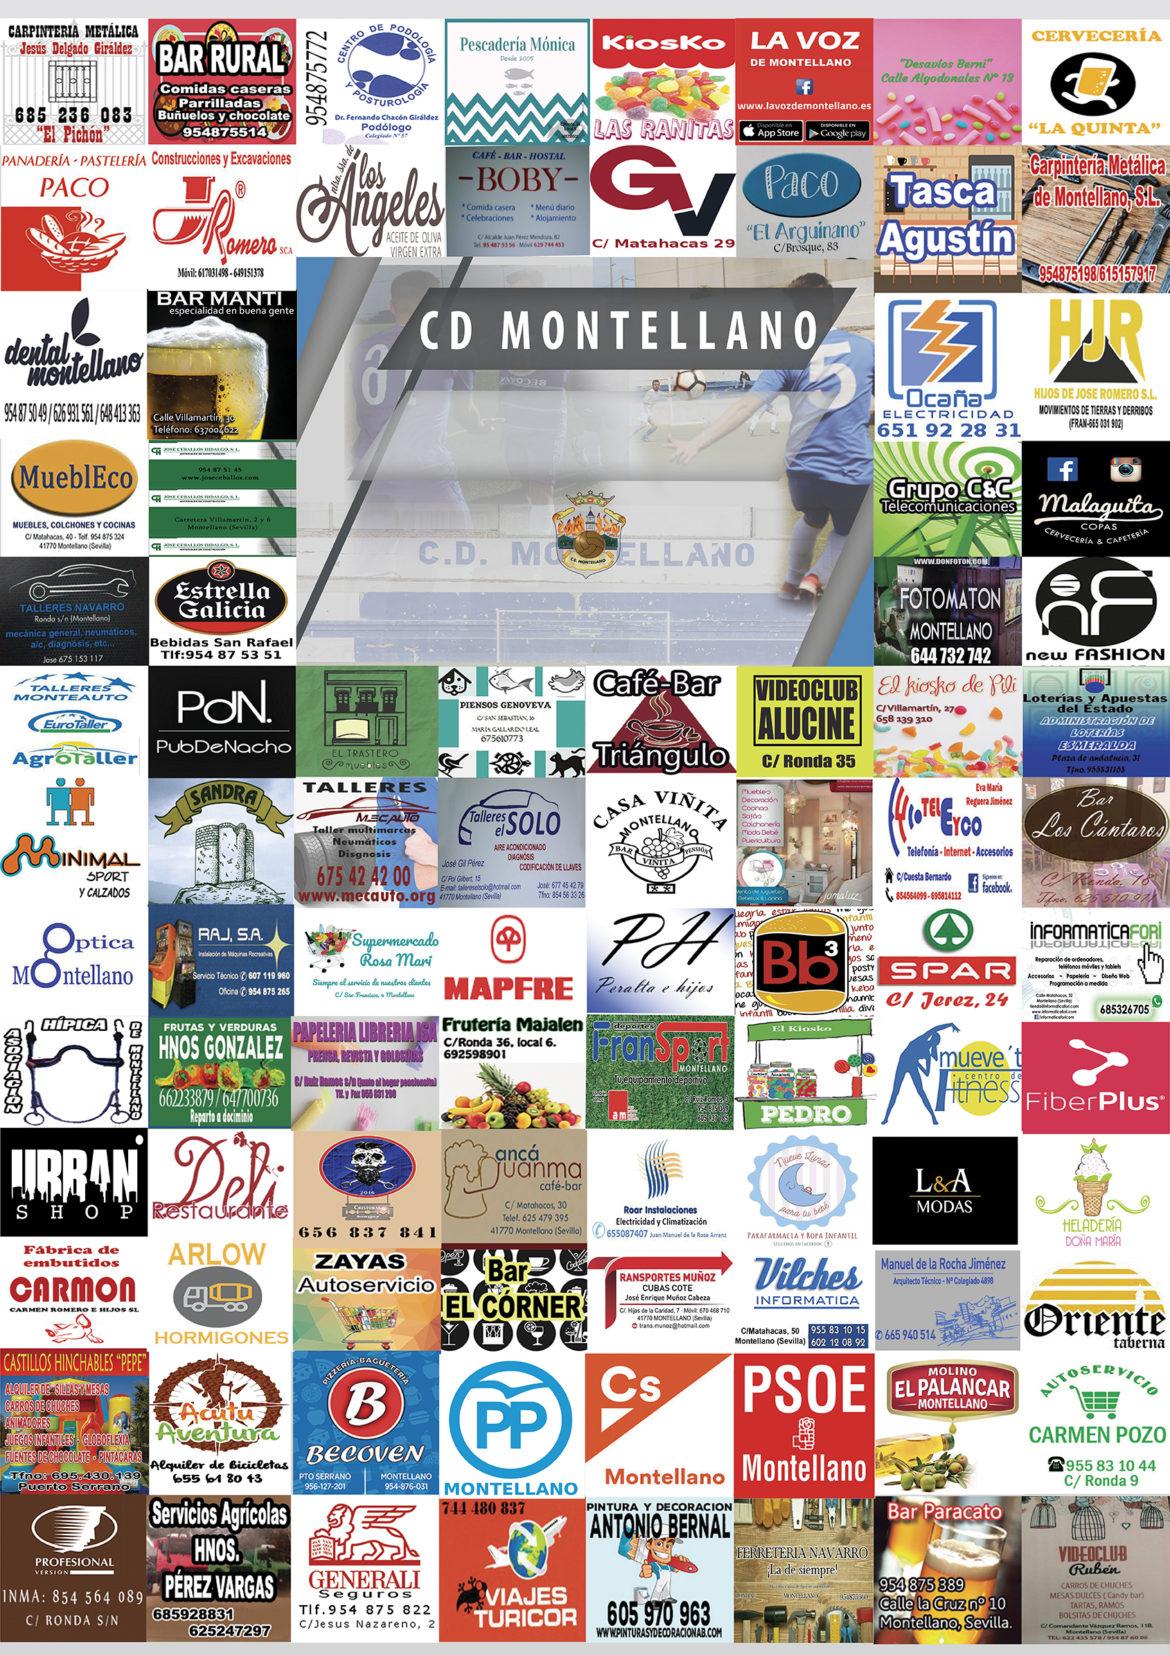 Cartel CD Montellano 2018/2019